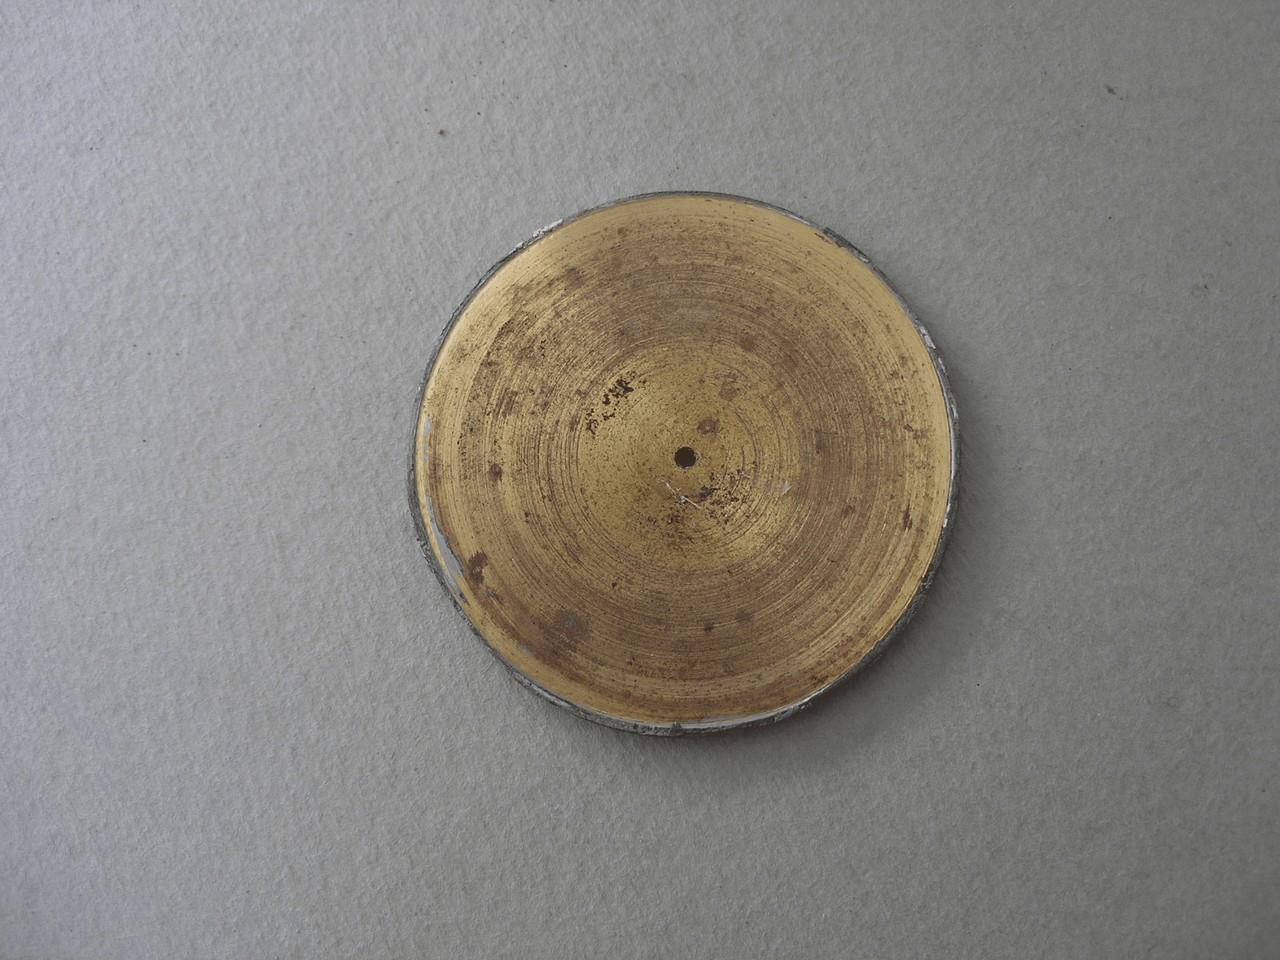 bilancia per il grano - bottega grossetana (sec. XIX)